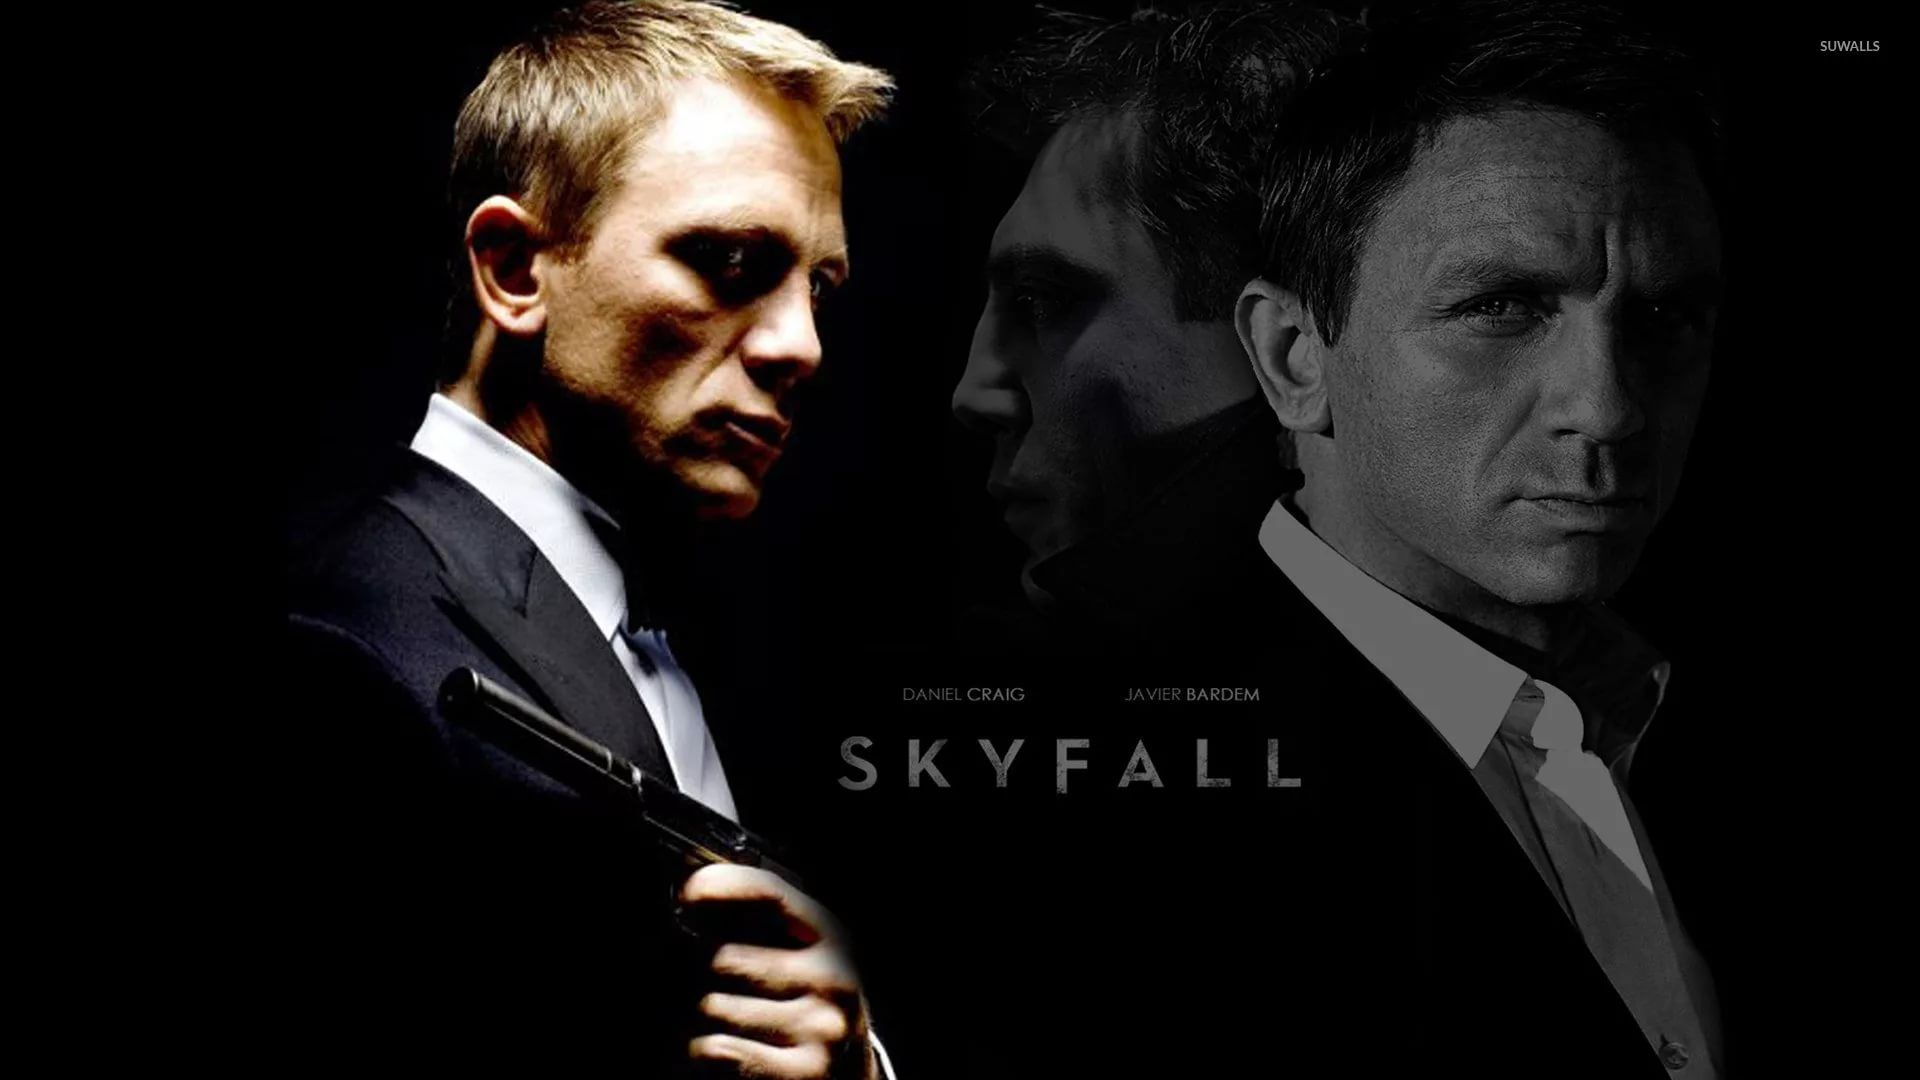 James Bond wallpaper image